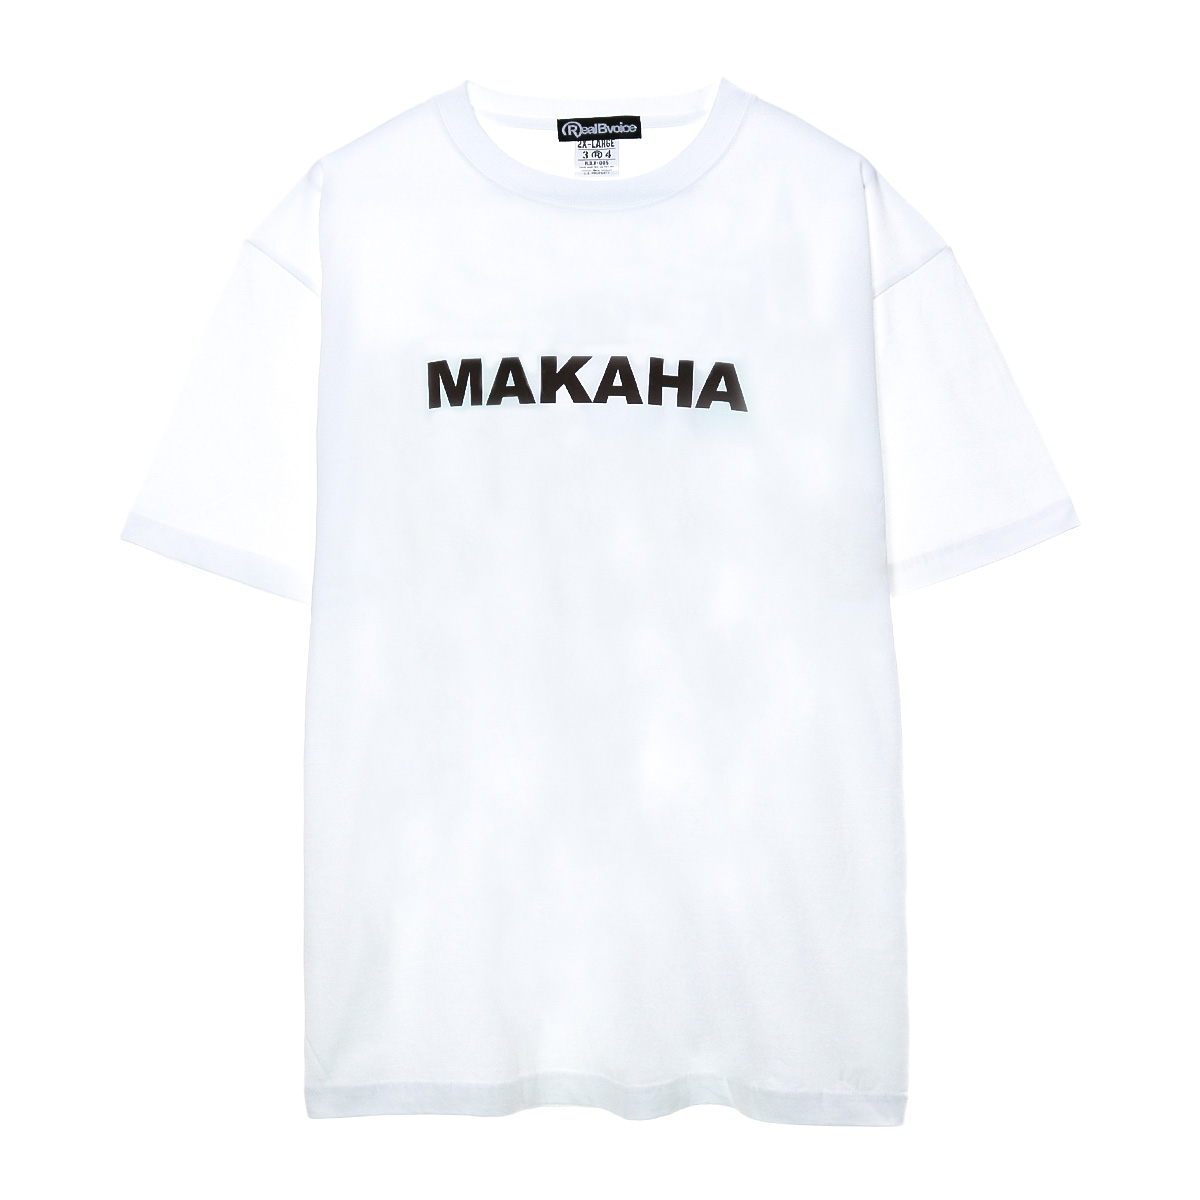 HAWAIIAN POPPY MAKAHA T-SHIRT BIG SIZE